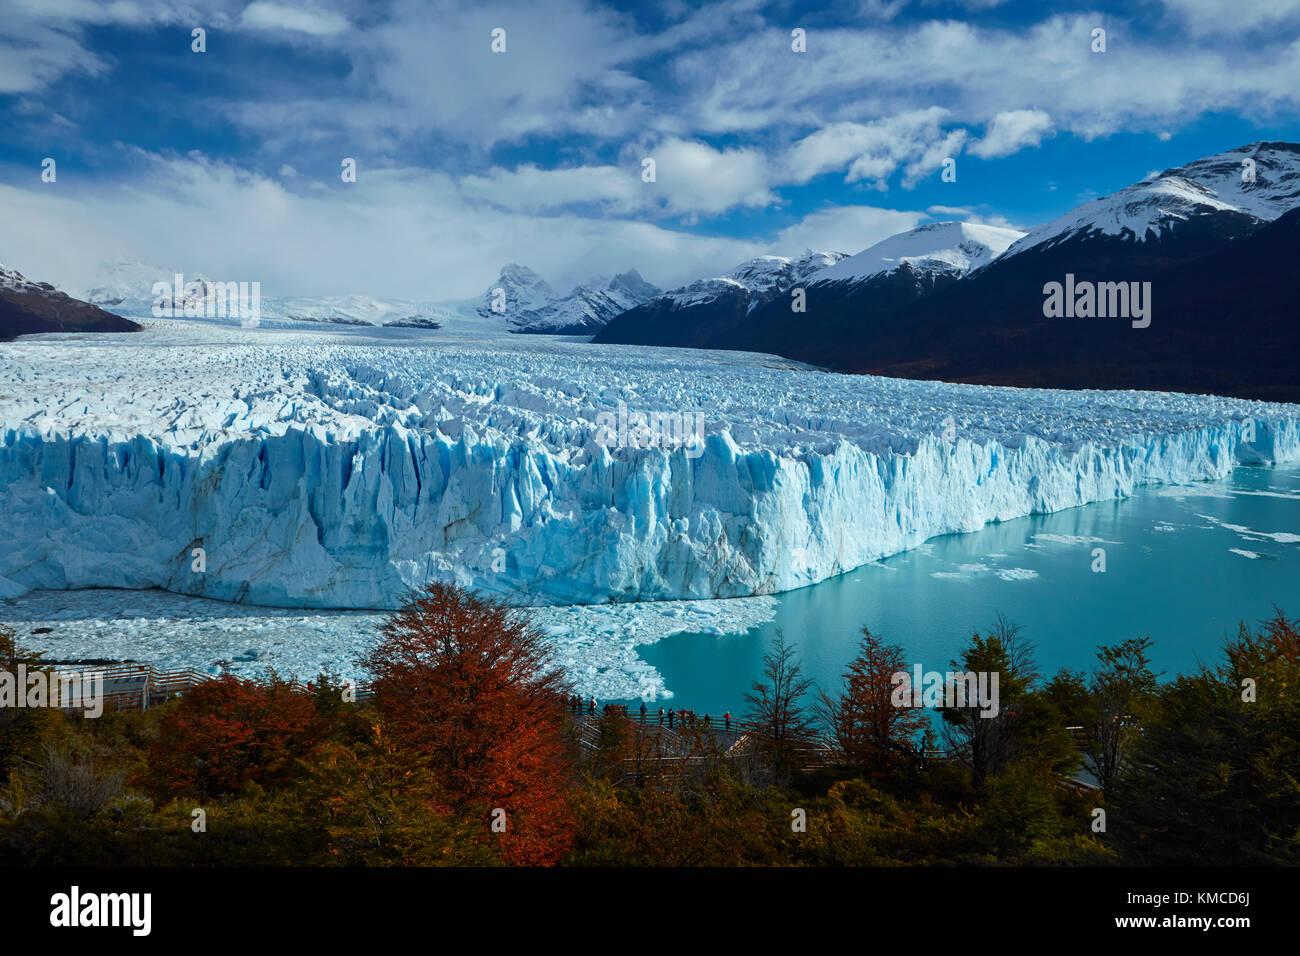 Perito Moreno Glacier, lenga trees in autumn, and tourists on walkway, Parque Nacional Los Glaciares (World Heritage Stock Photo